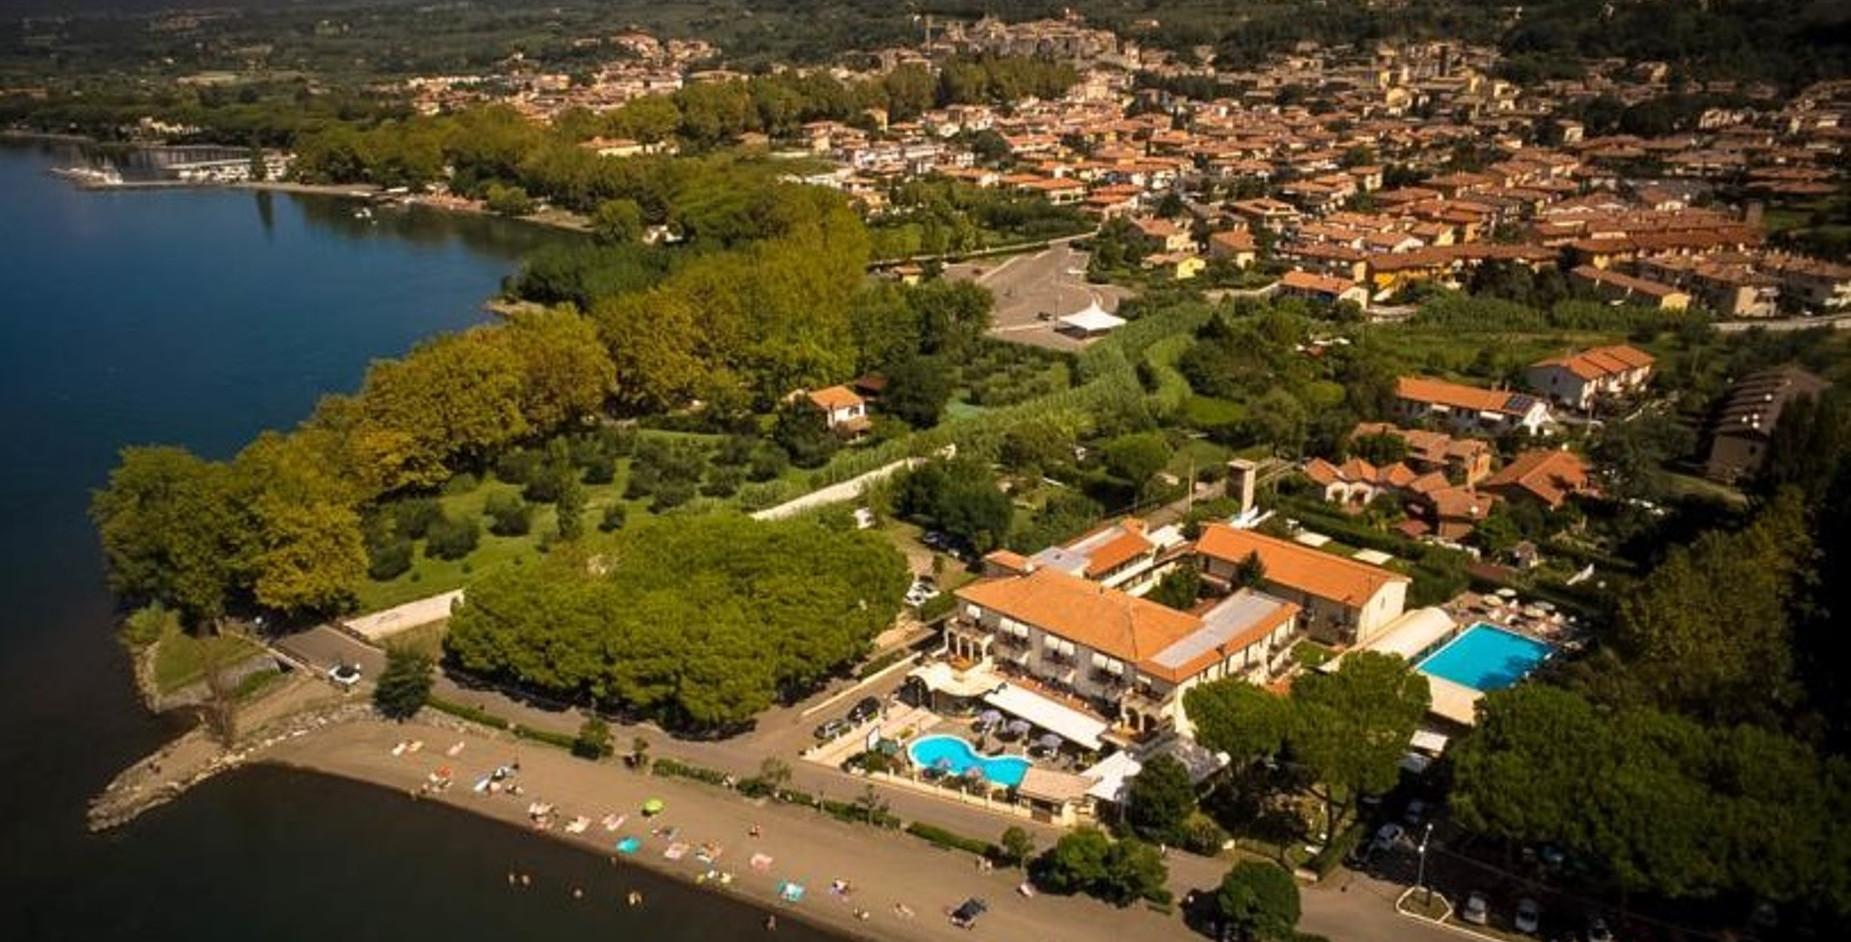 Lake Bolsena, our hotel